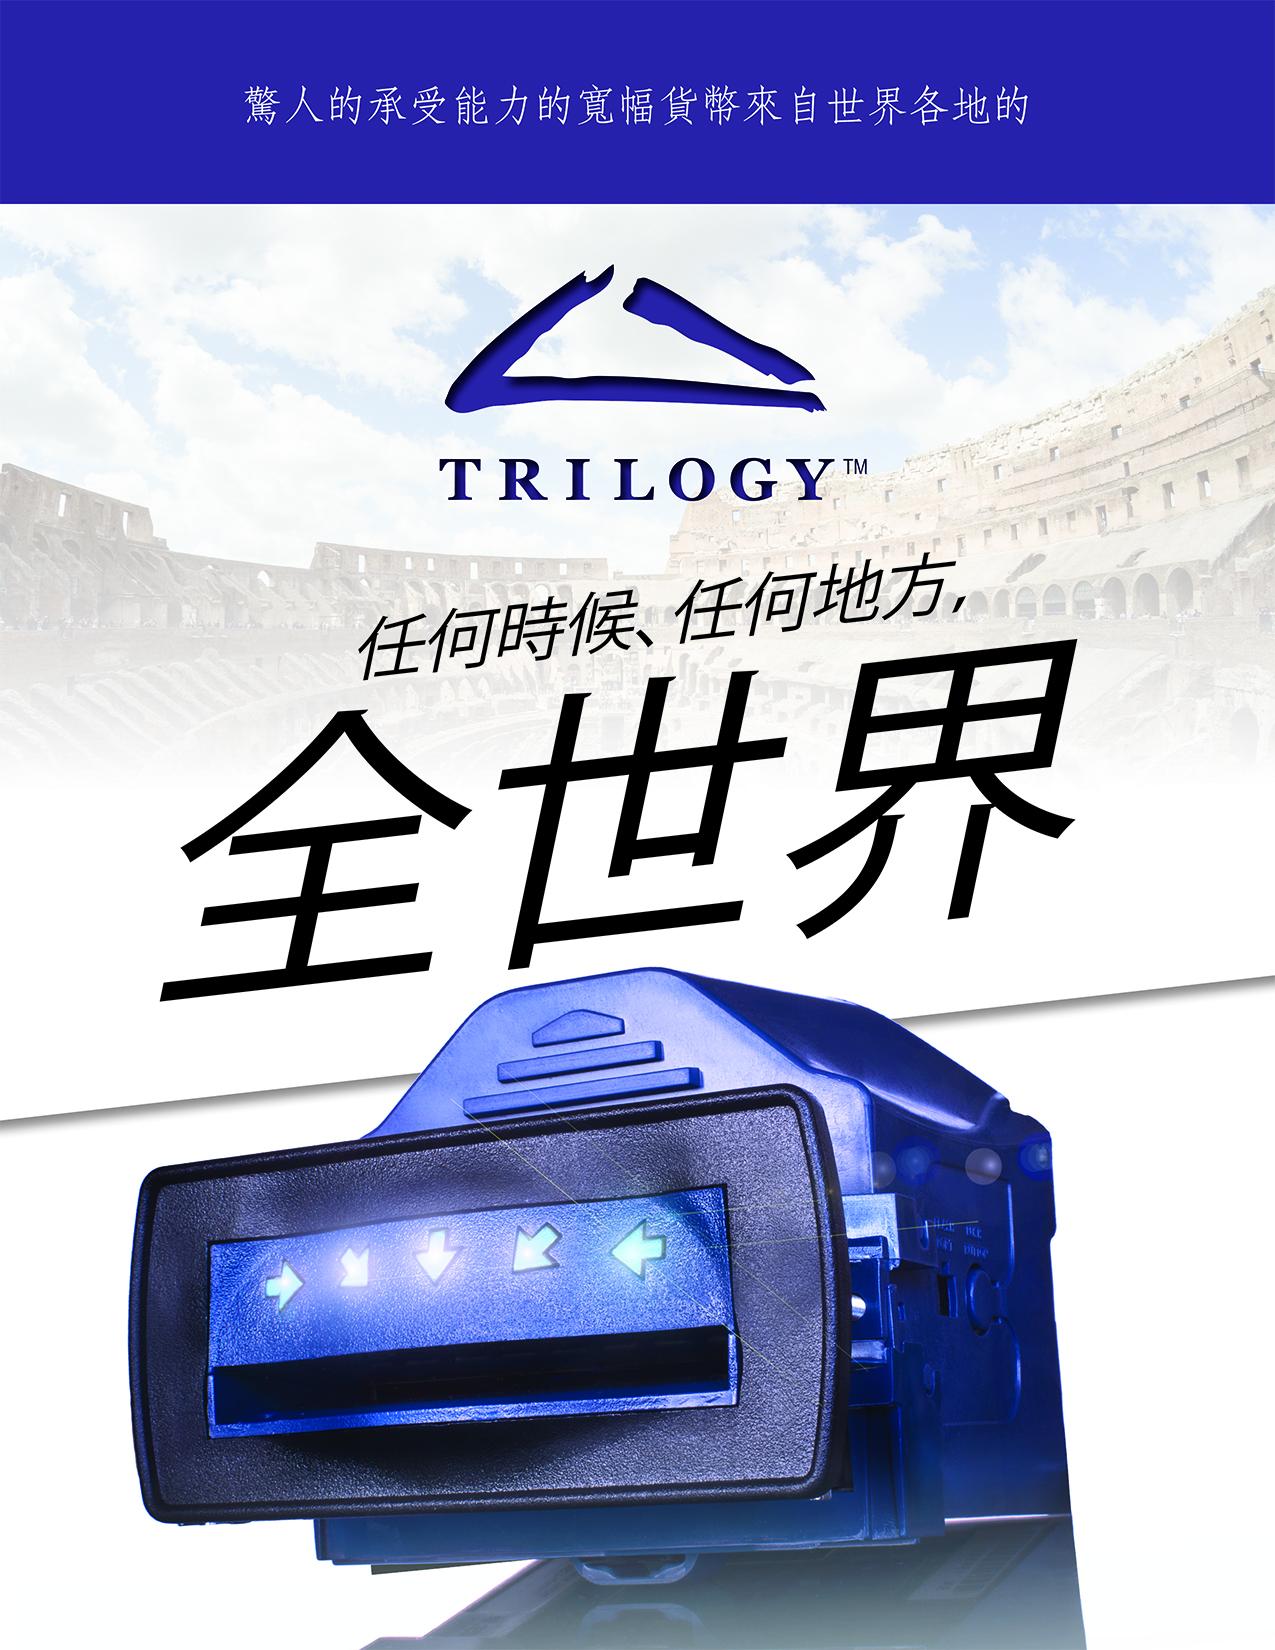 Trilogy5_CHINESE-1.jpg